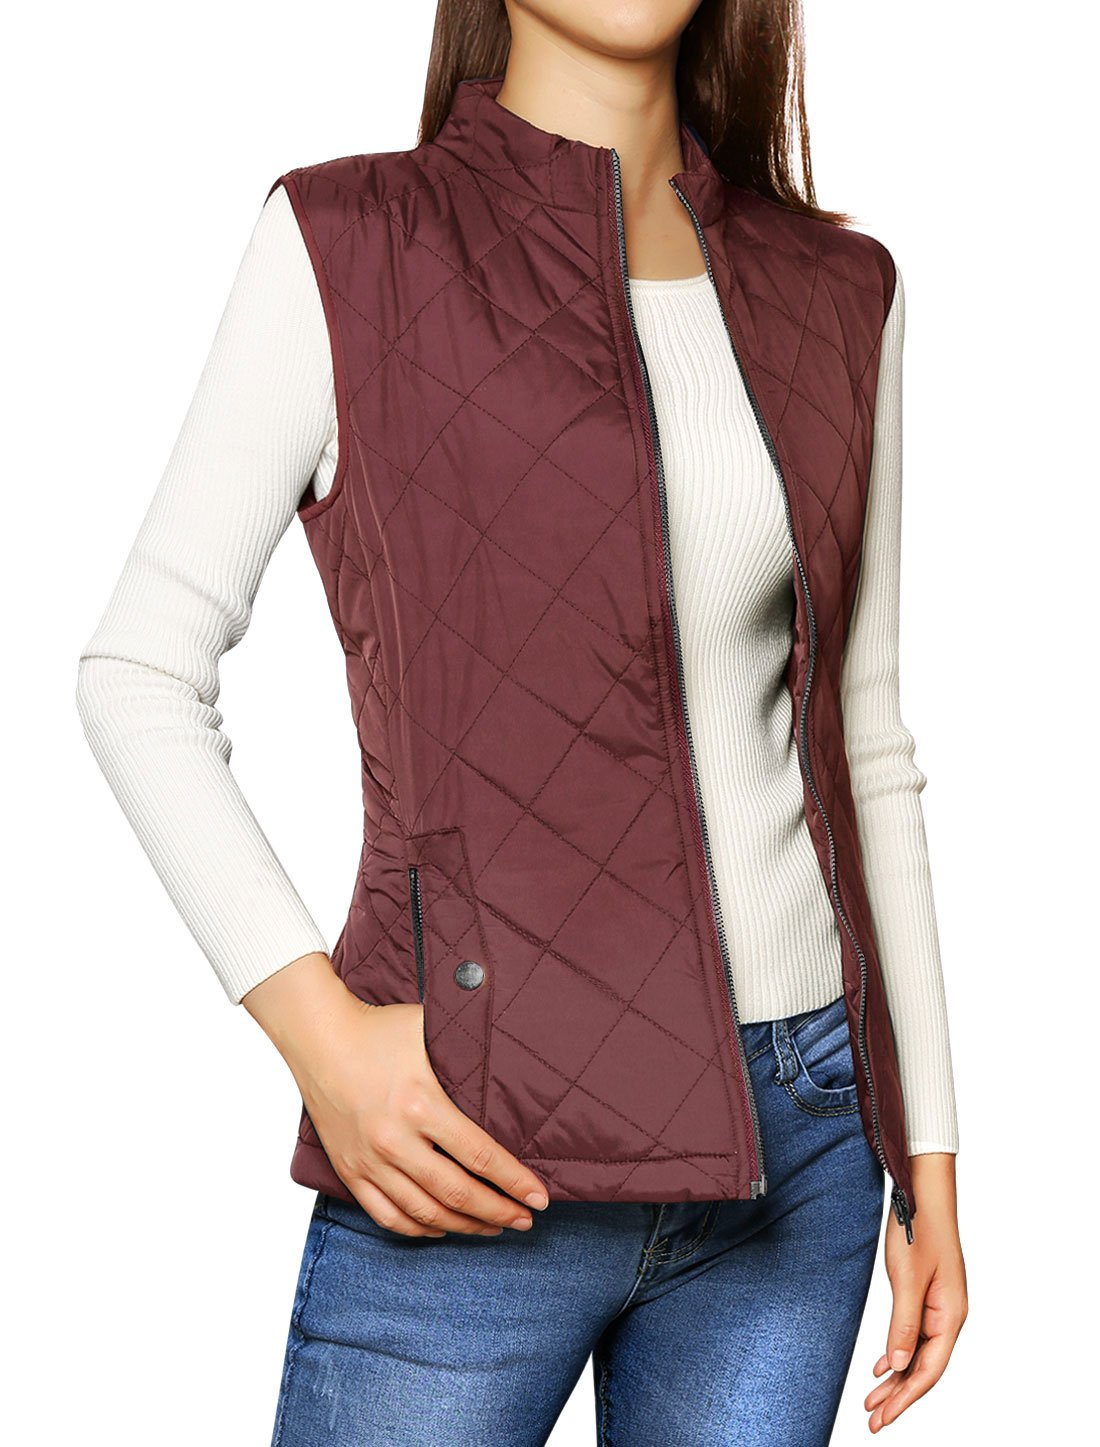 Allegra K Women's Stand Collar Lightweight Gilet Quilted Zip Vest Red X-Small